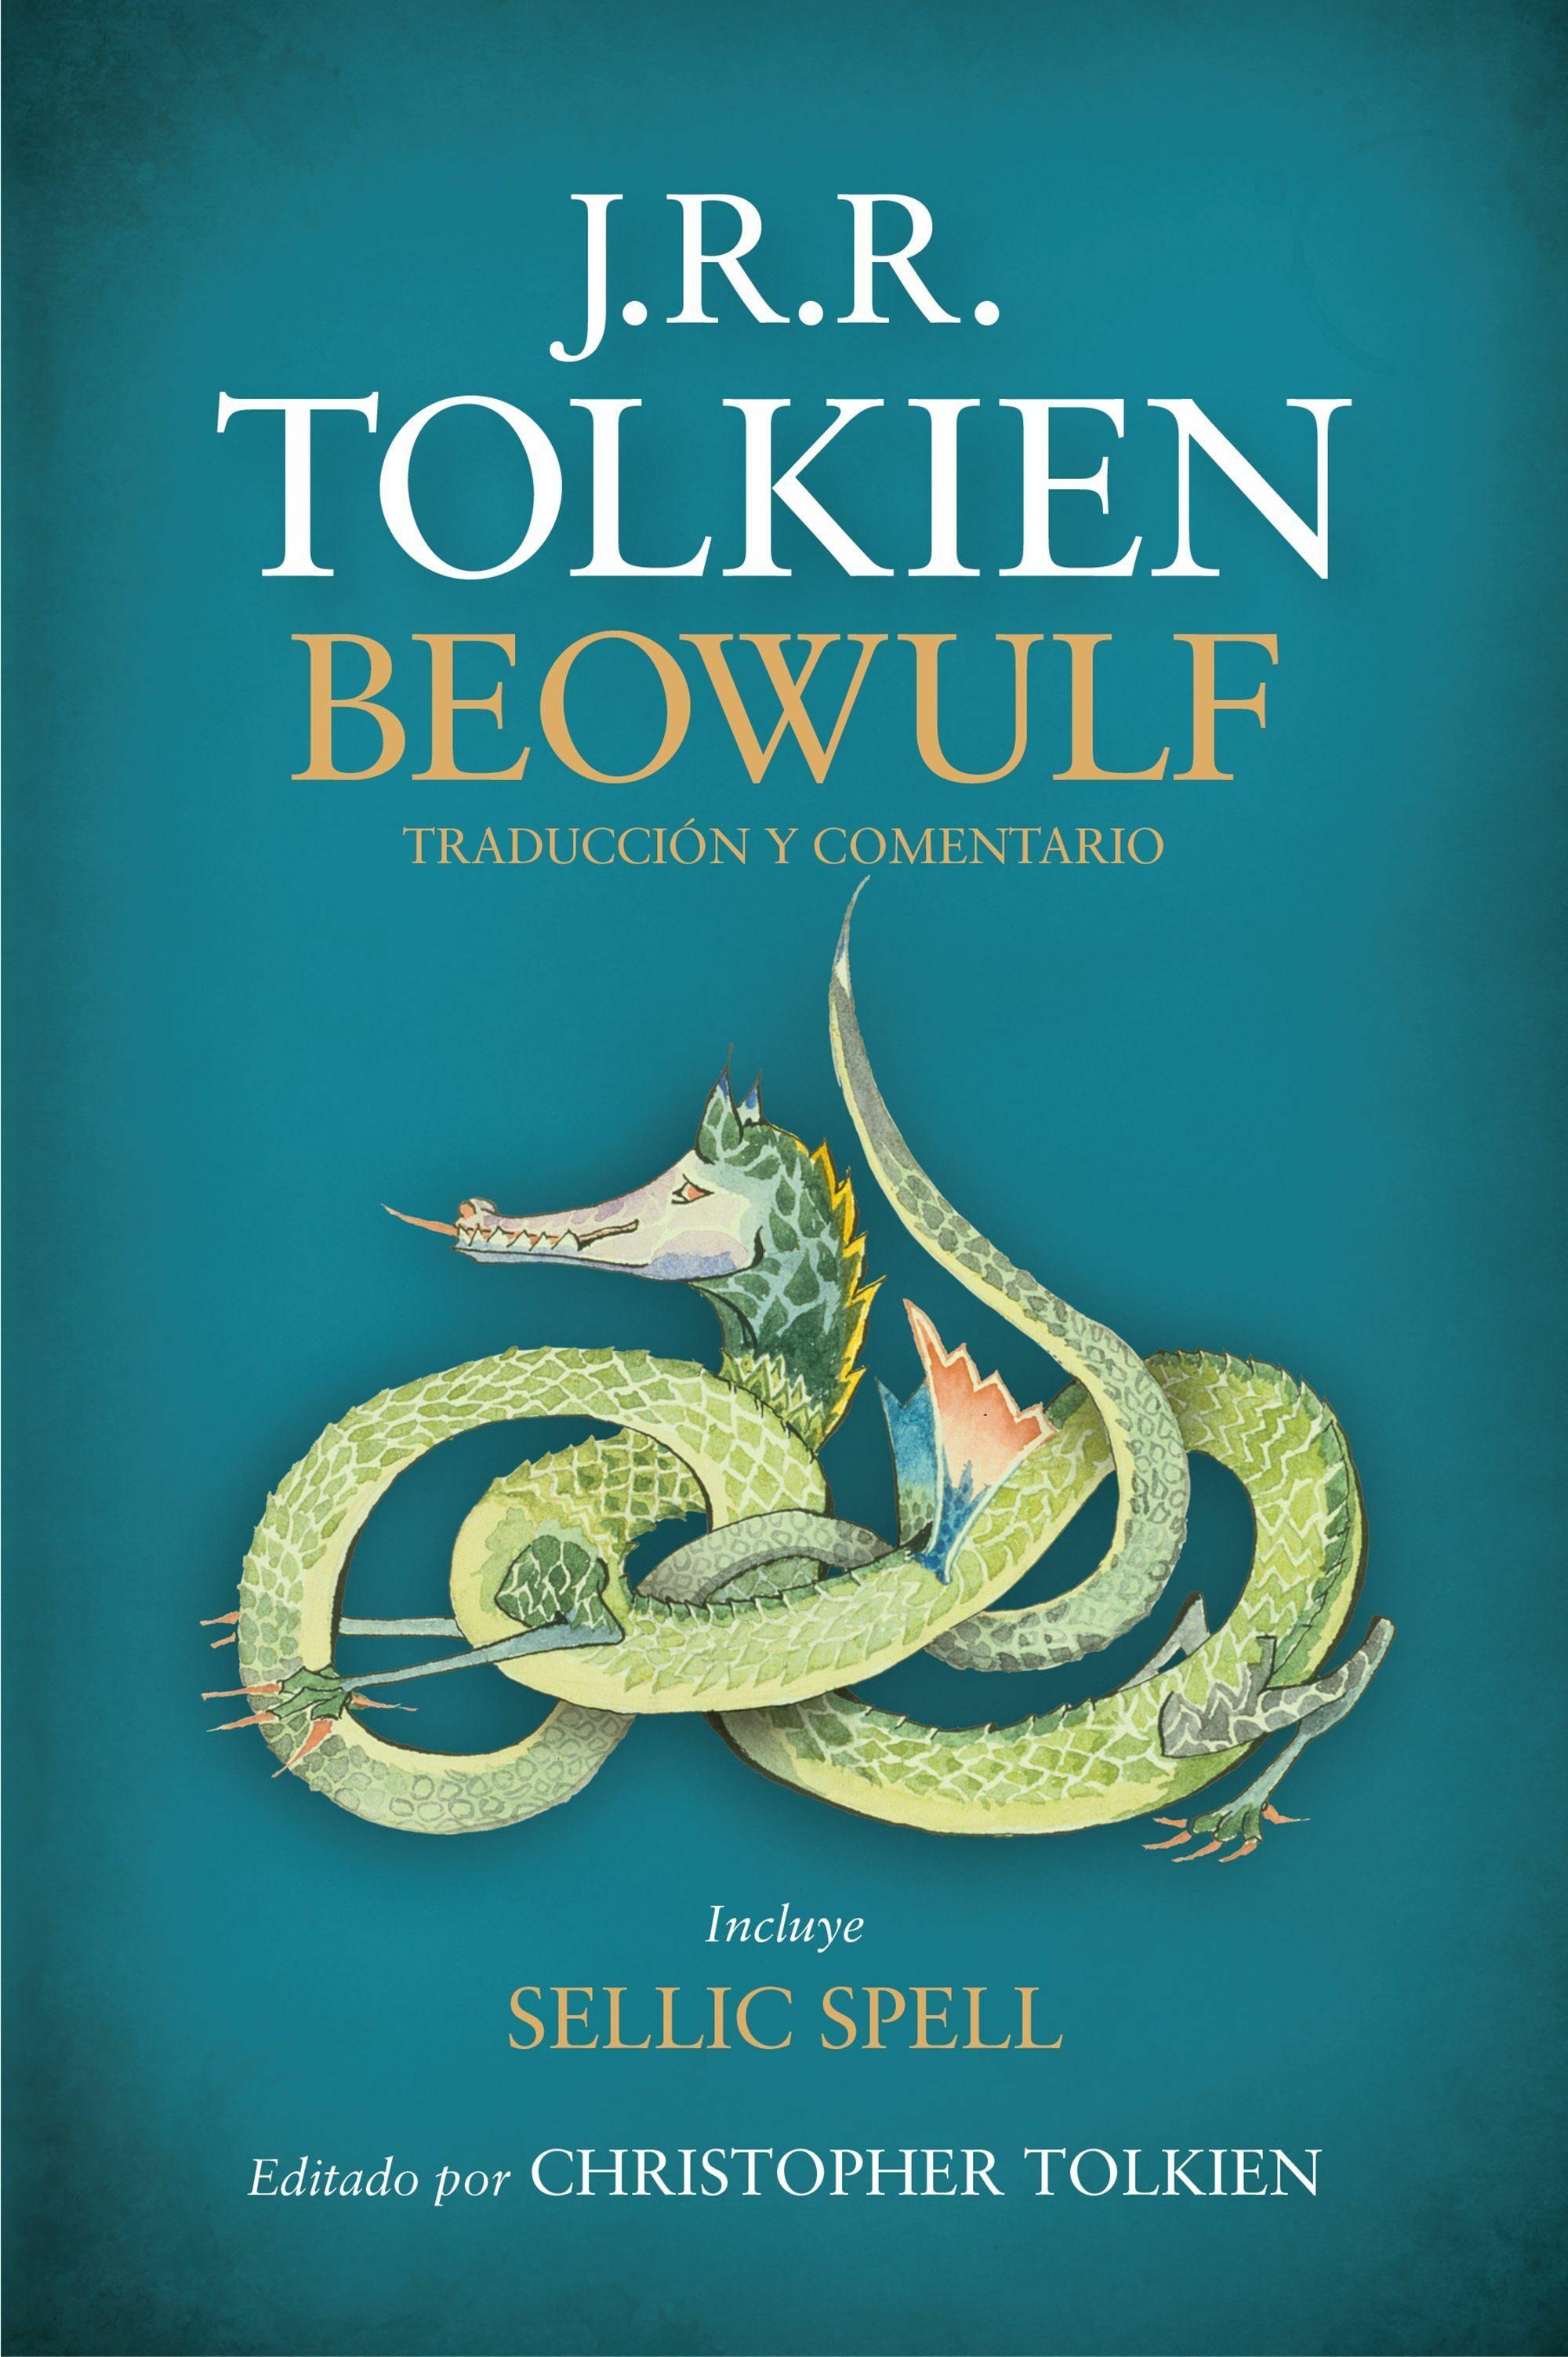 Beowulf (Biblioteca J. R. R. Tolkien)